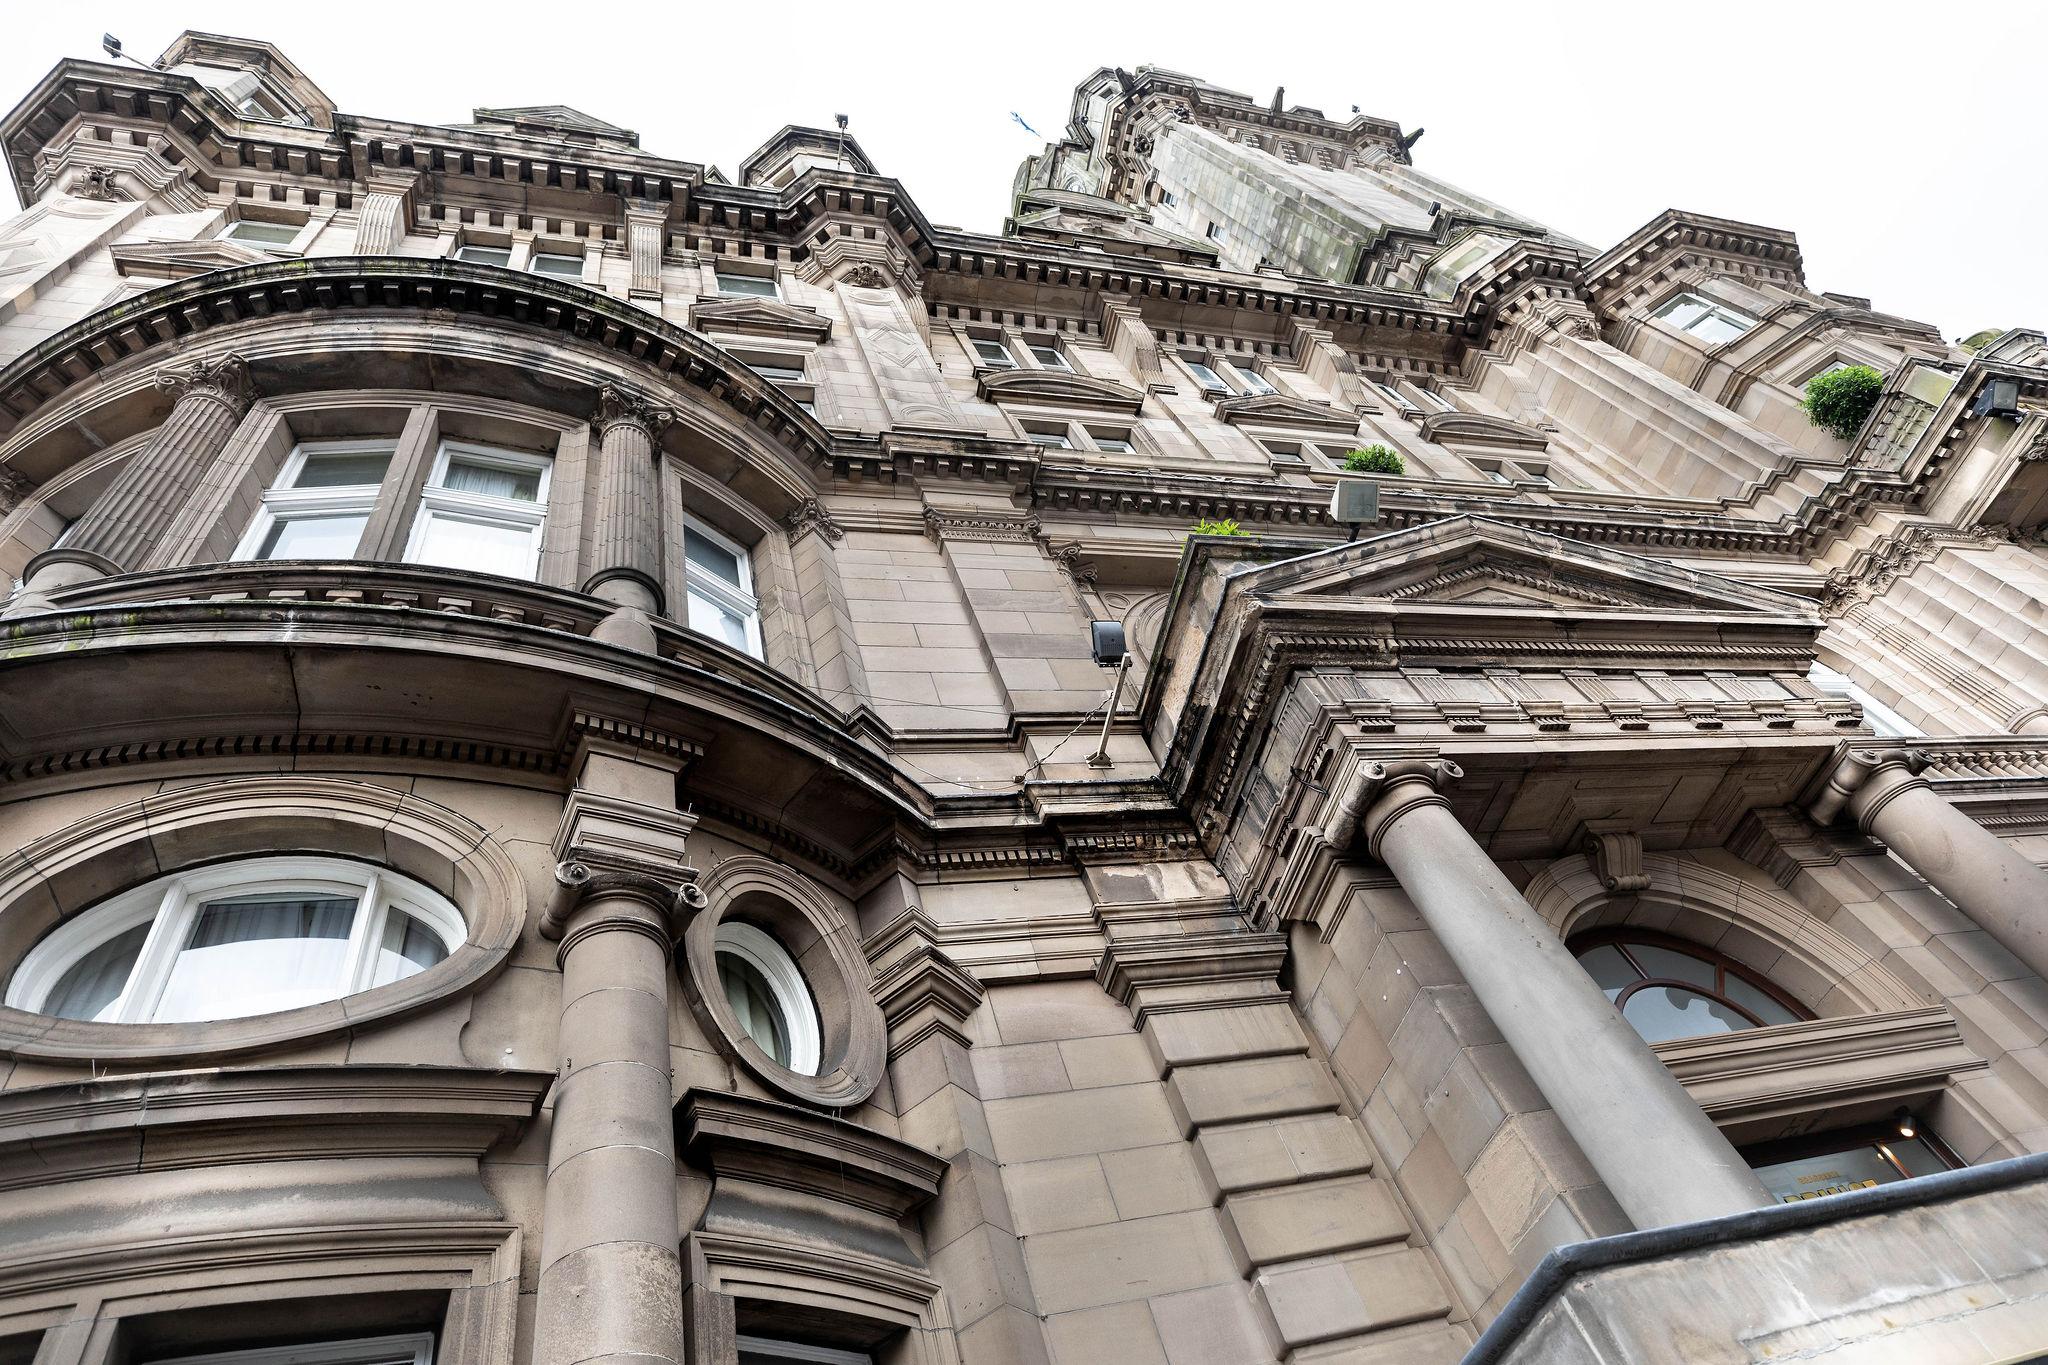 Exterior of The Scotsman Hotel in Edinburgh, Scotland